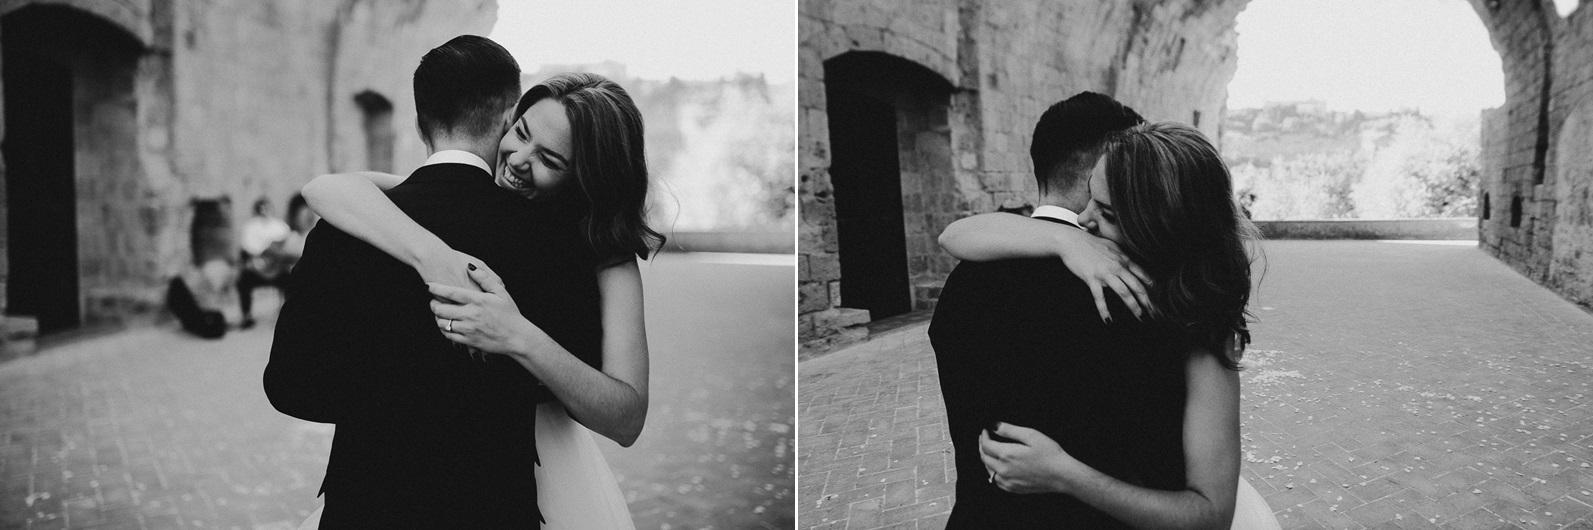 stylish-elopement-photographer-italy (86).jpg